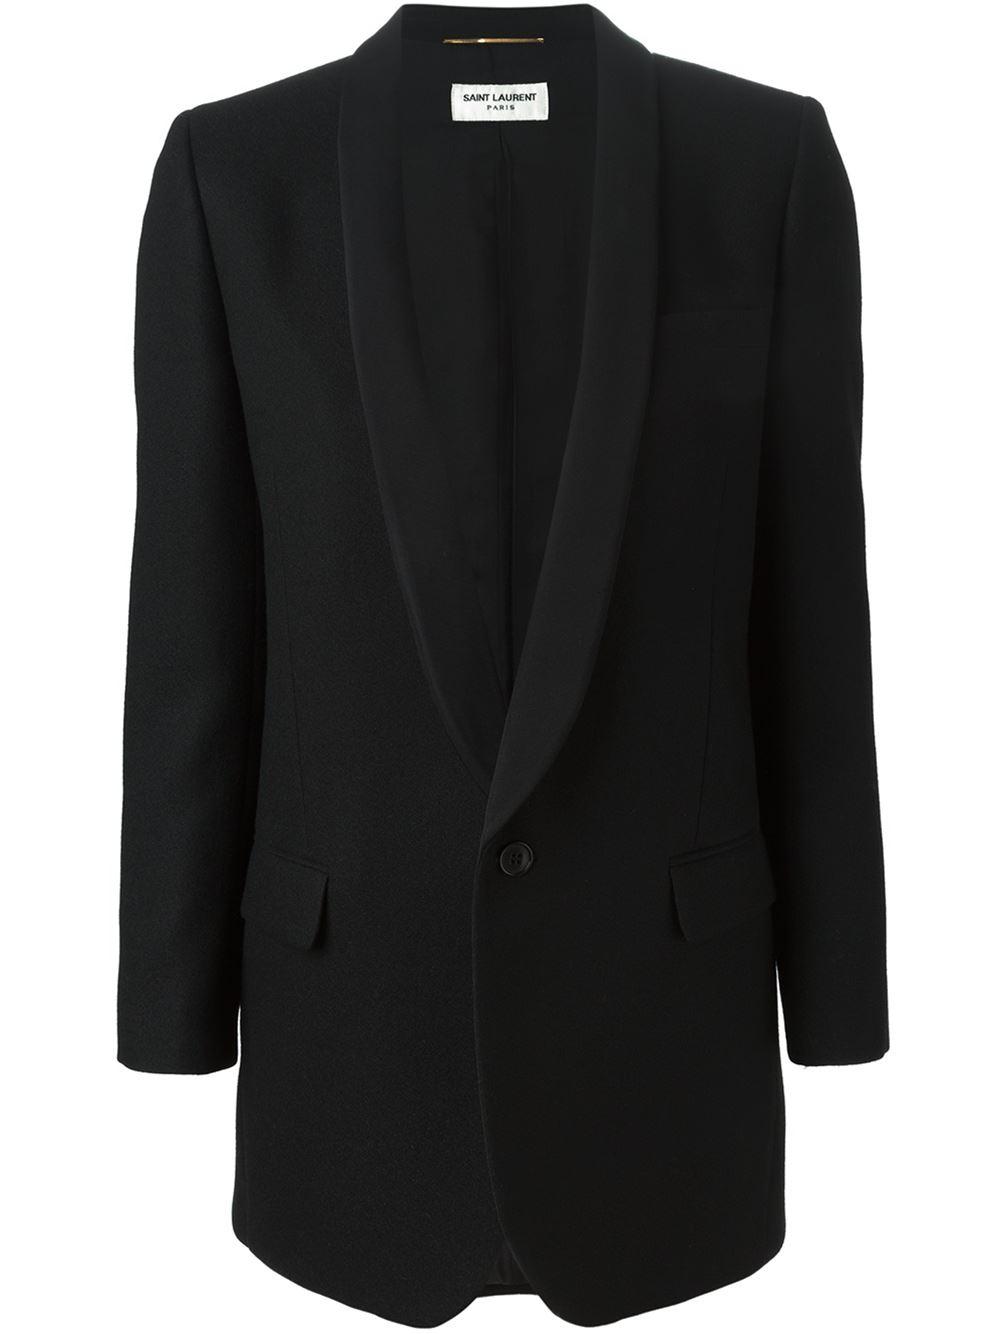 st_laurent_jacket.jpg